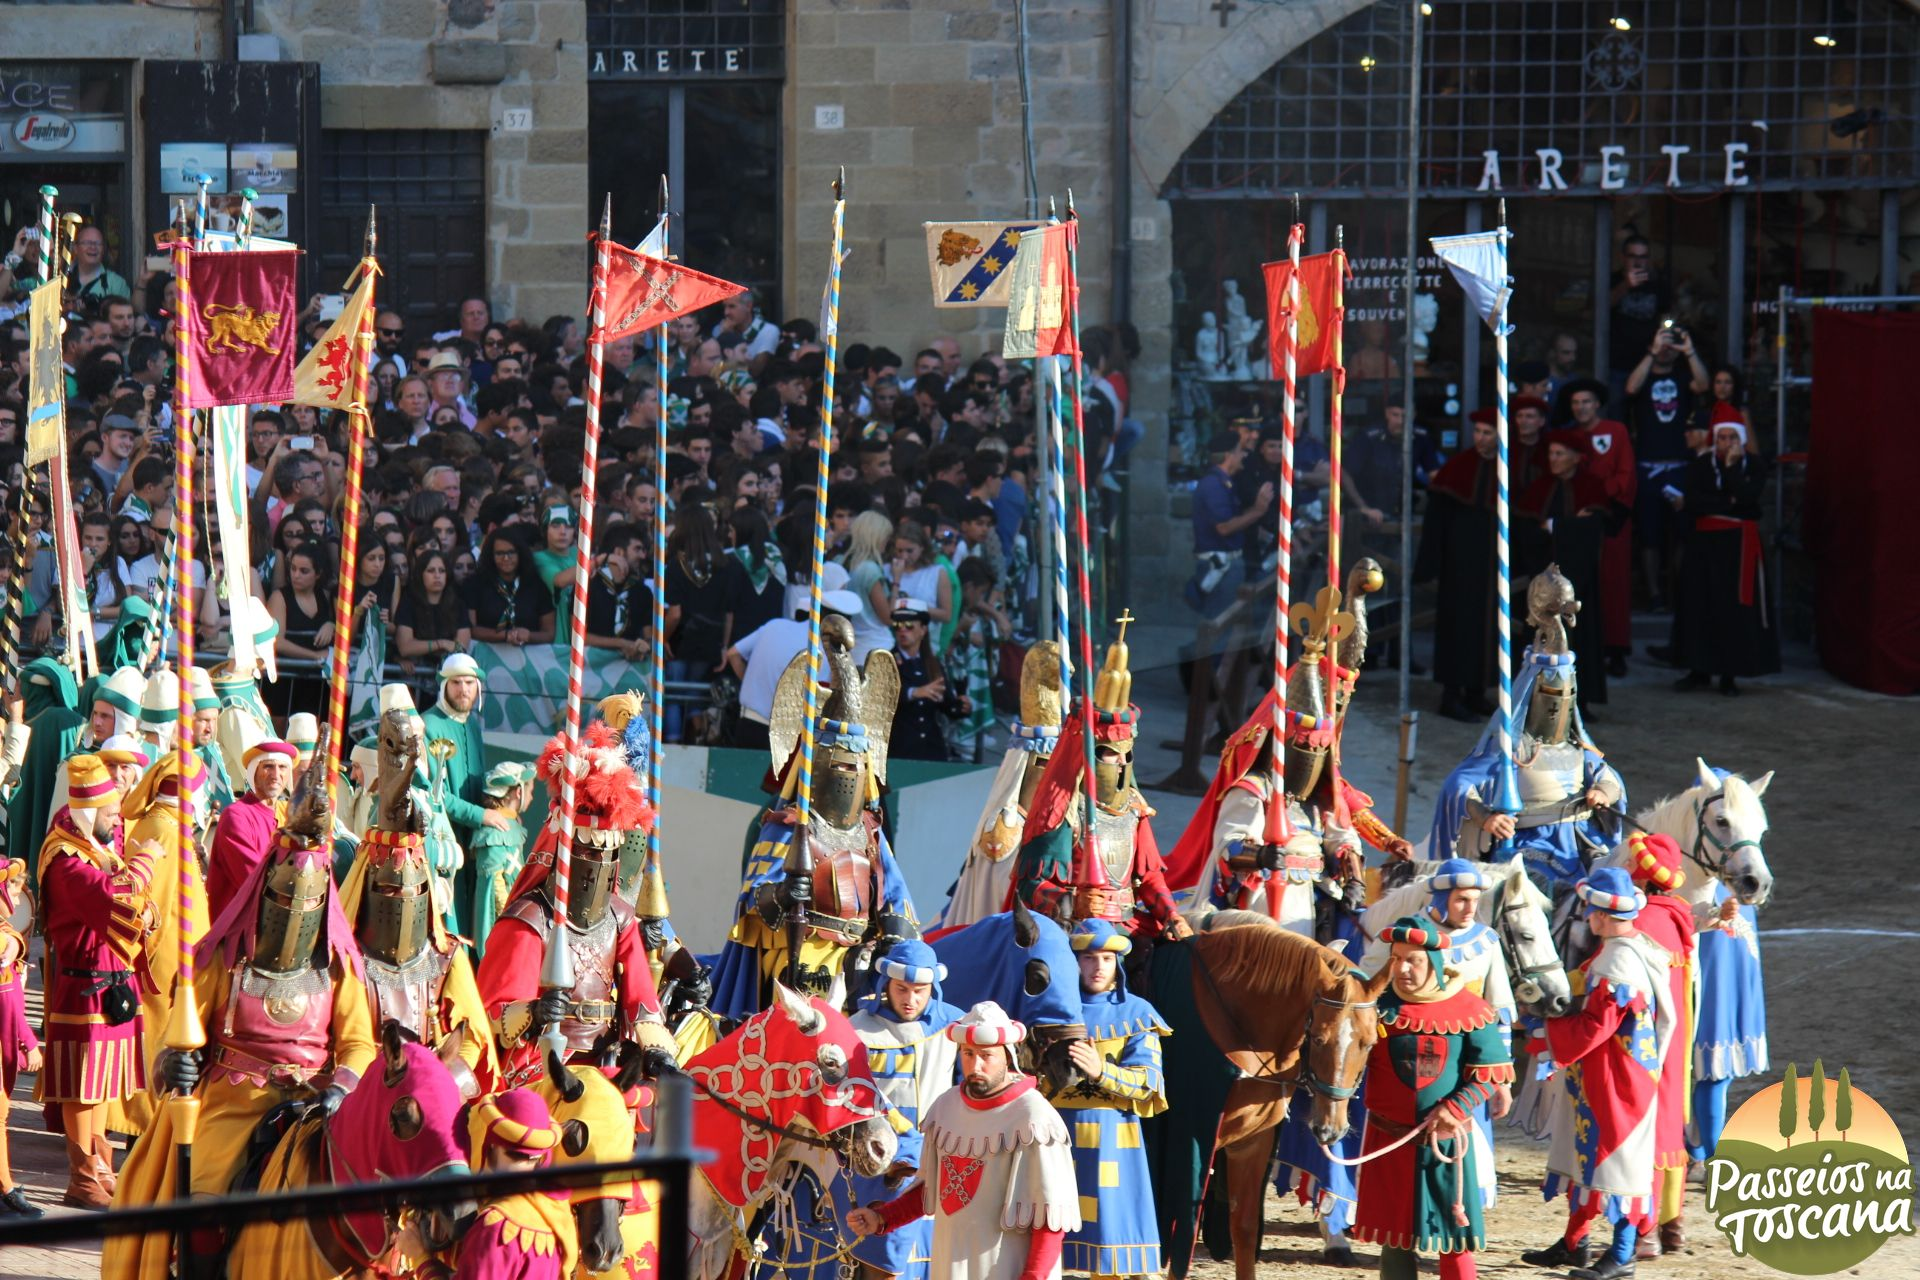 Festas Medievais na Toscana